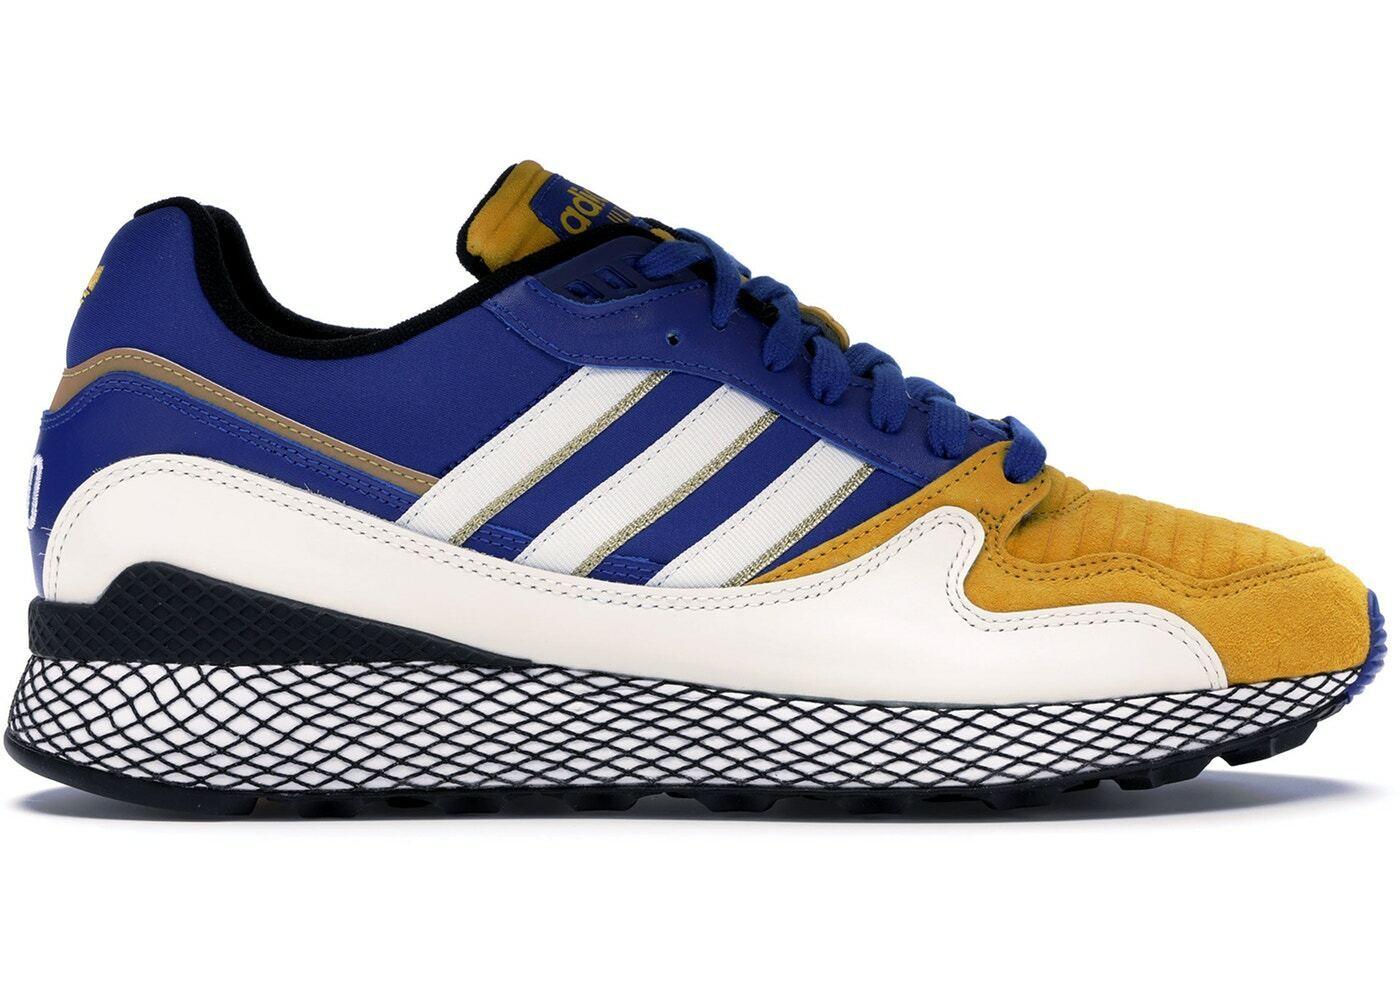 NEW  Adidas X Dragon Ball Z - Vegeta - Ultra Tech - bluee & Yellow - Size 10 US